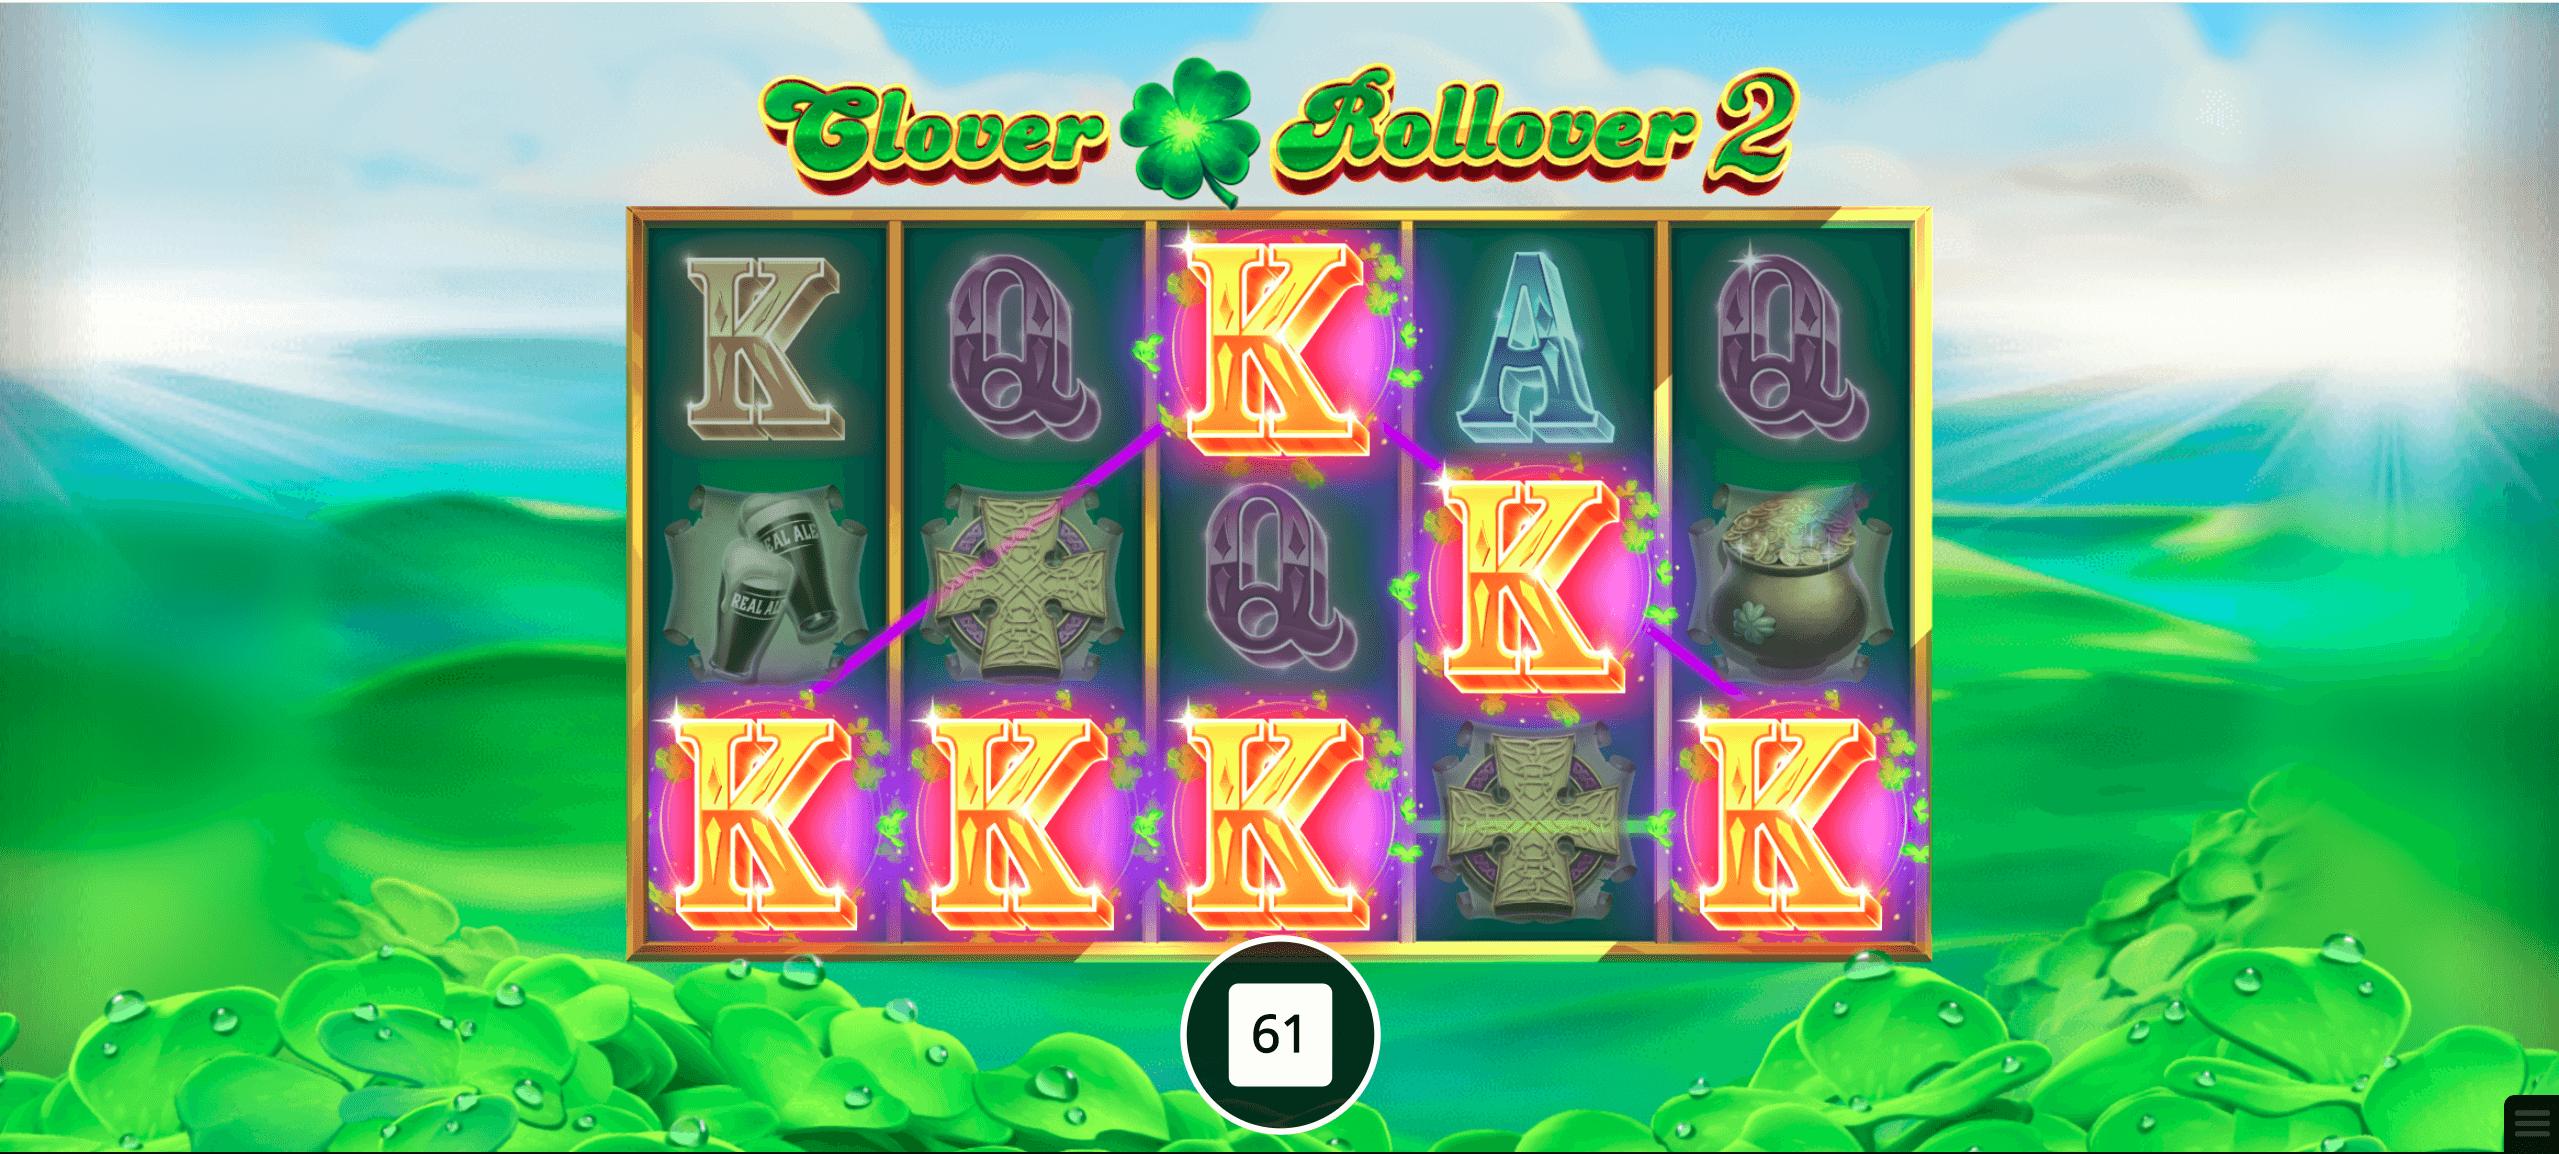 Play Clover Rollover 2 Slot | 50 Free Spins | PlayOJO